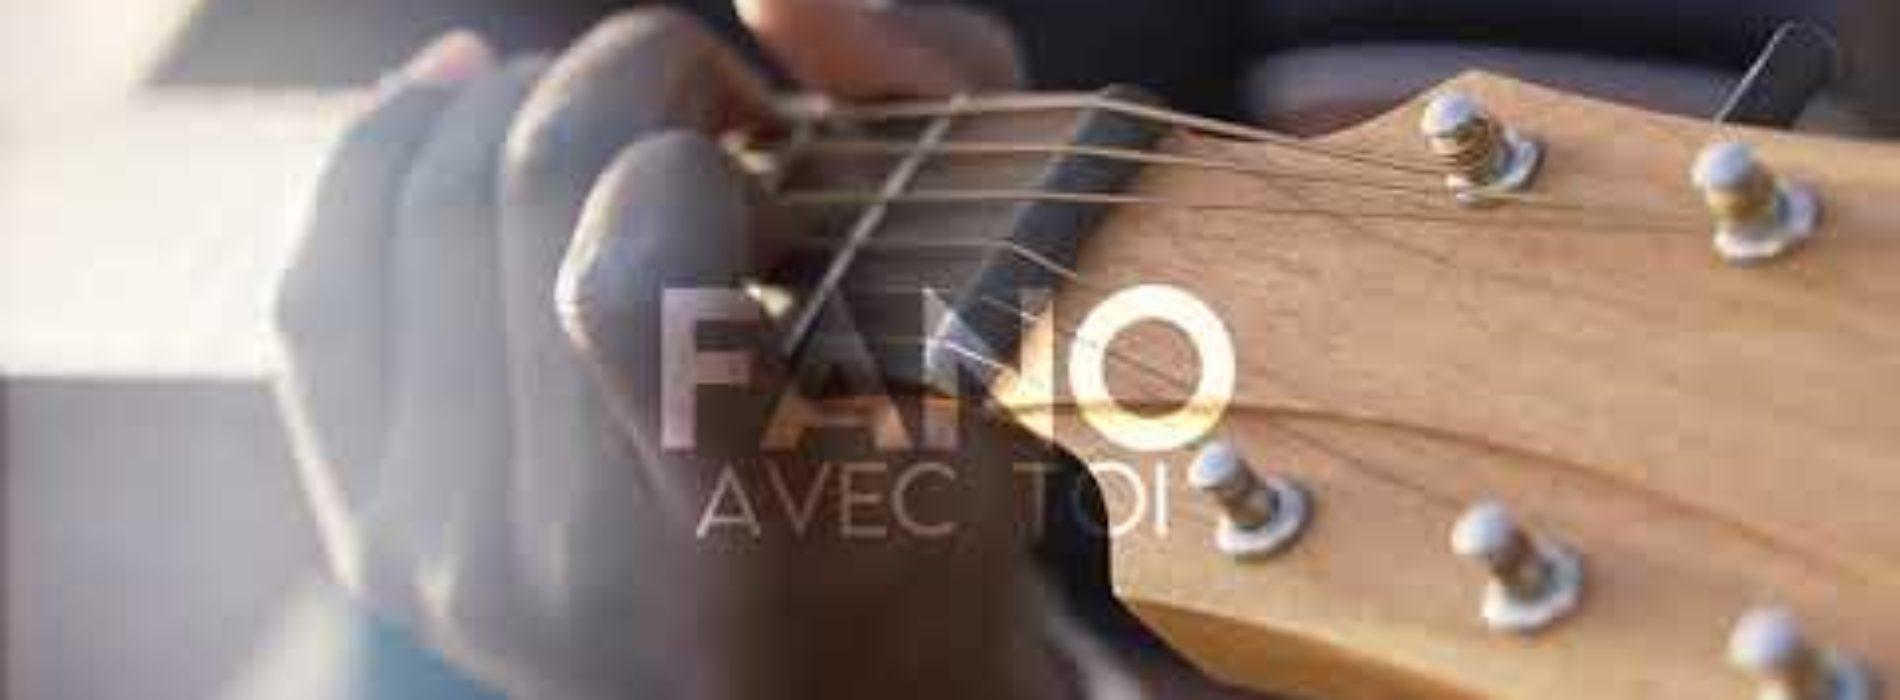 FANO – AVEC TOI (CLIP OFFICIEL) – Septembre 2020